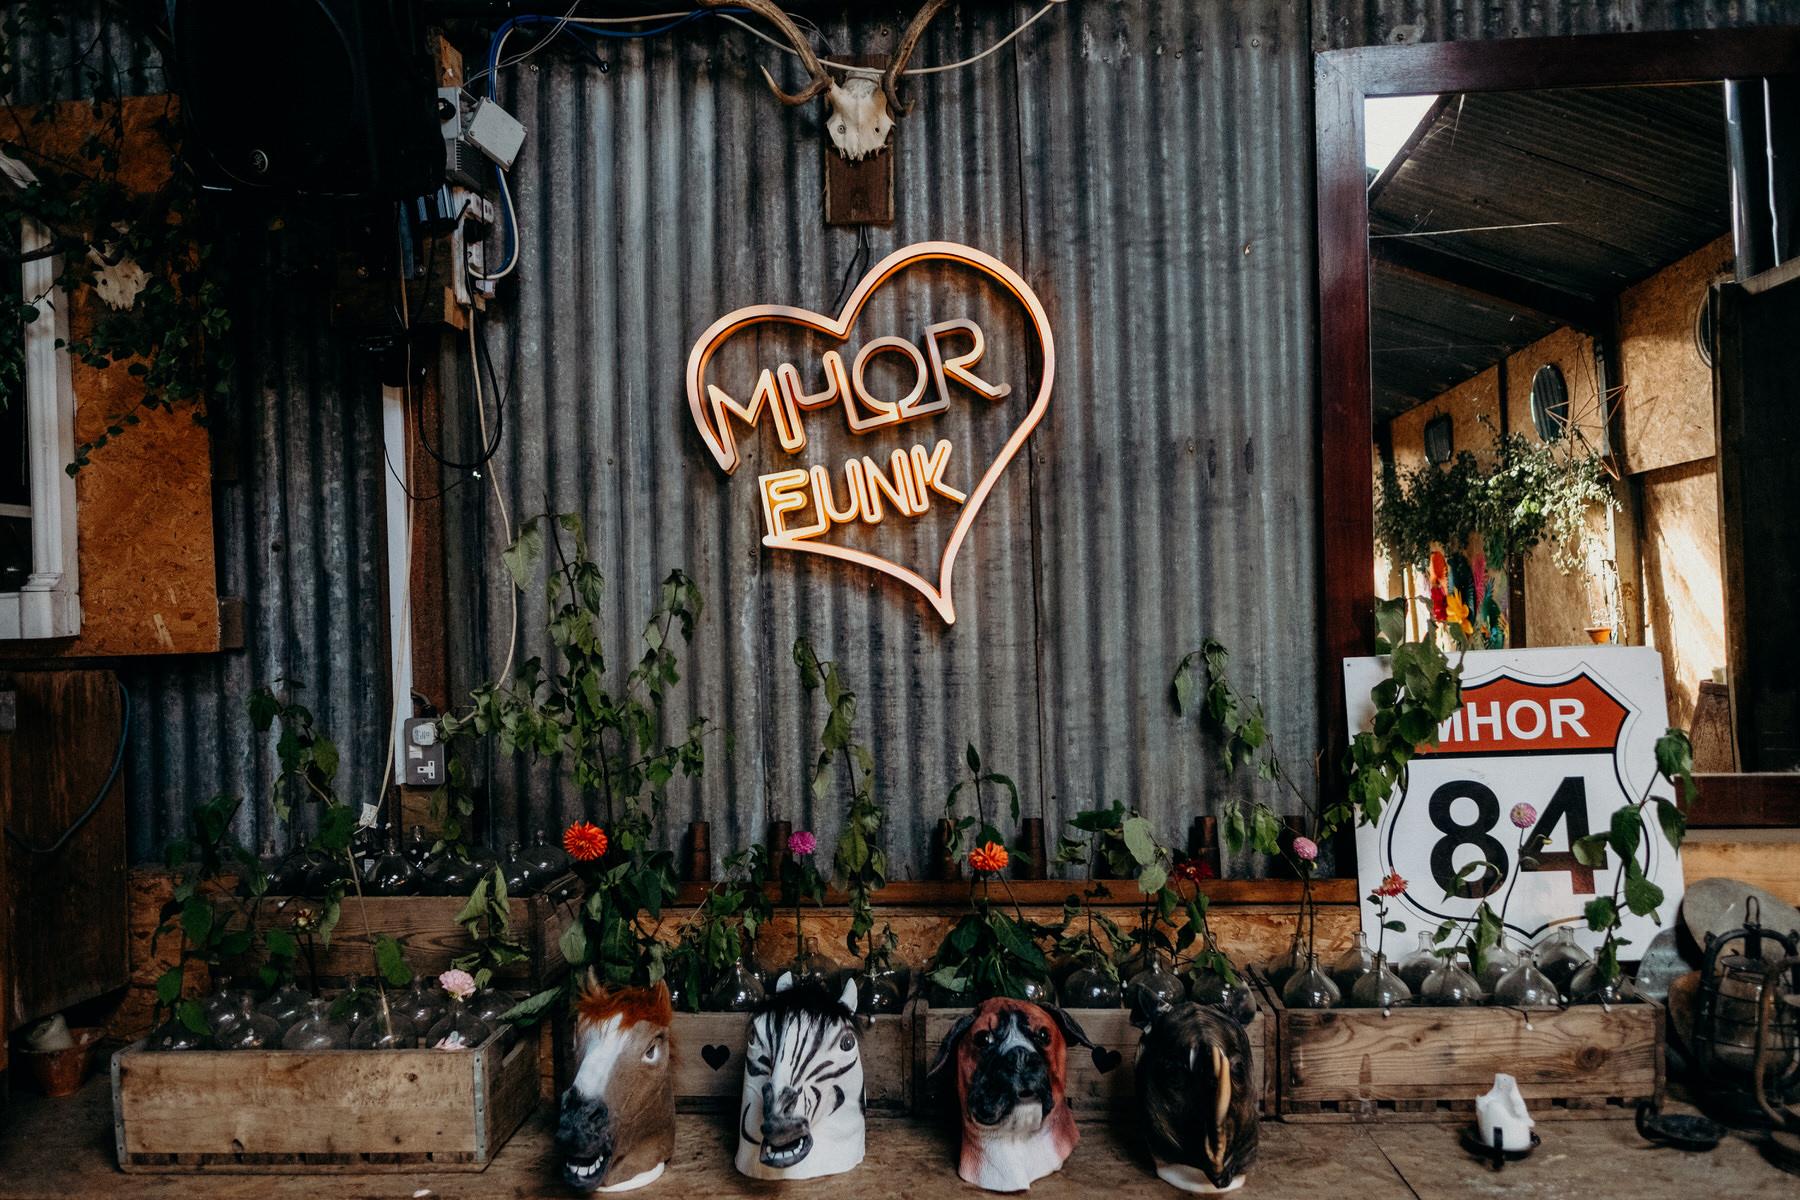 002-Flo-Robert-Monachyle-Mhor-Wedding.jpg